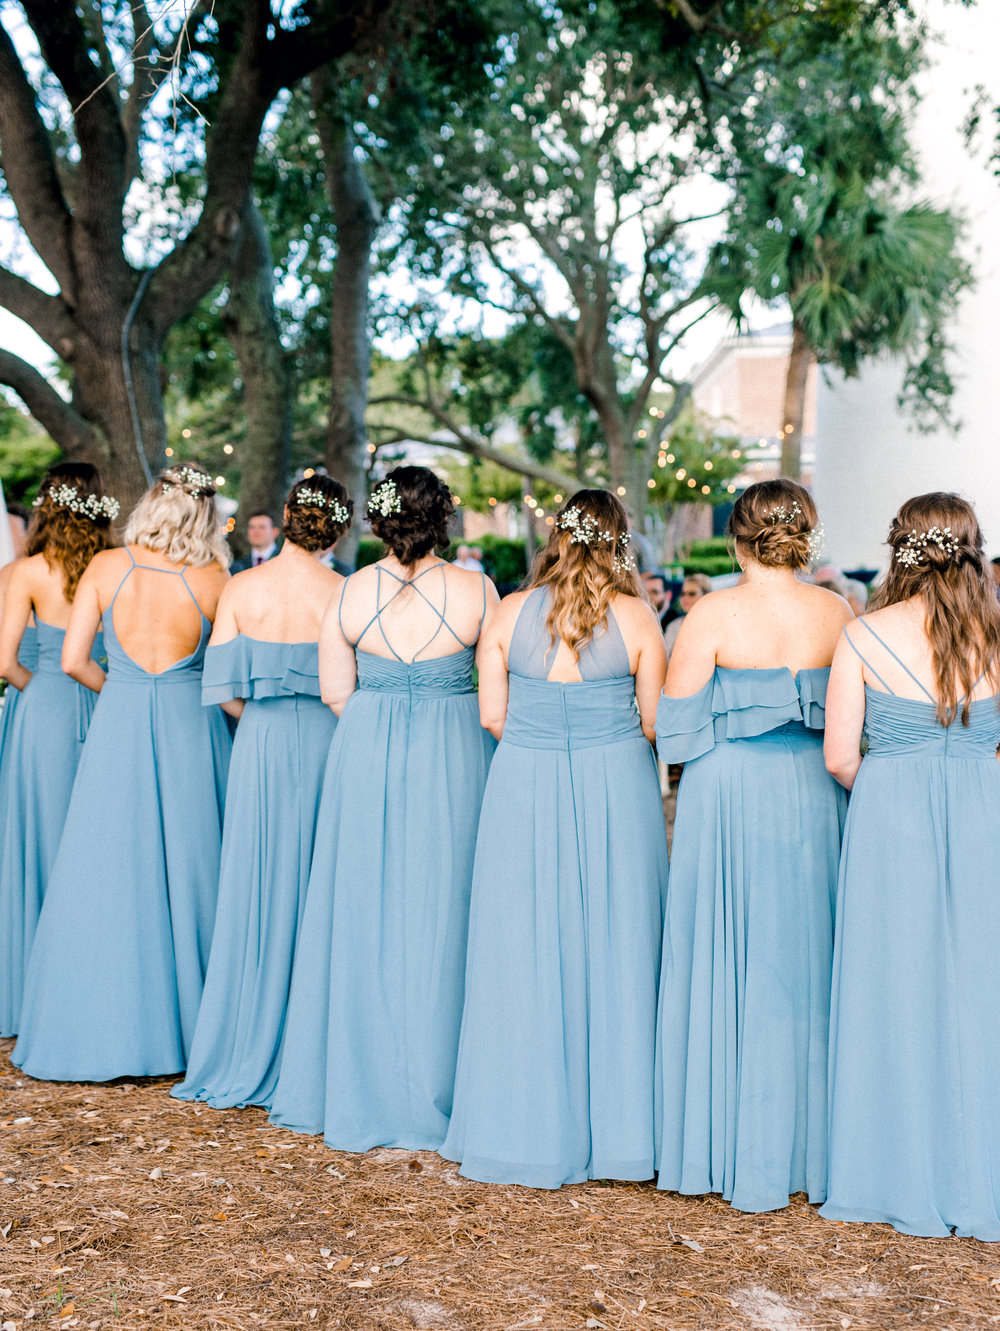 14saint_simons_island_wedding_megan_the_photographerIMG_8963.jpg